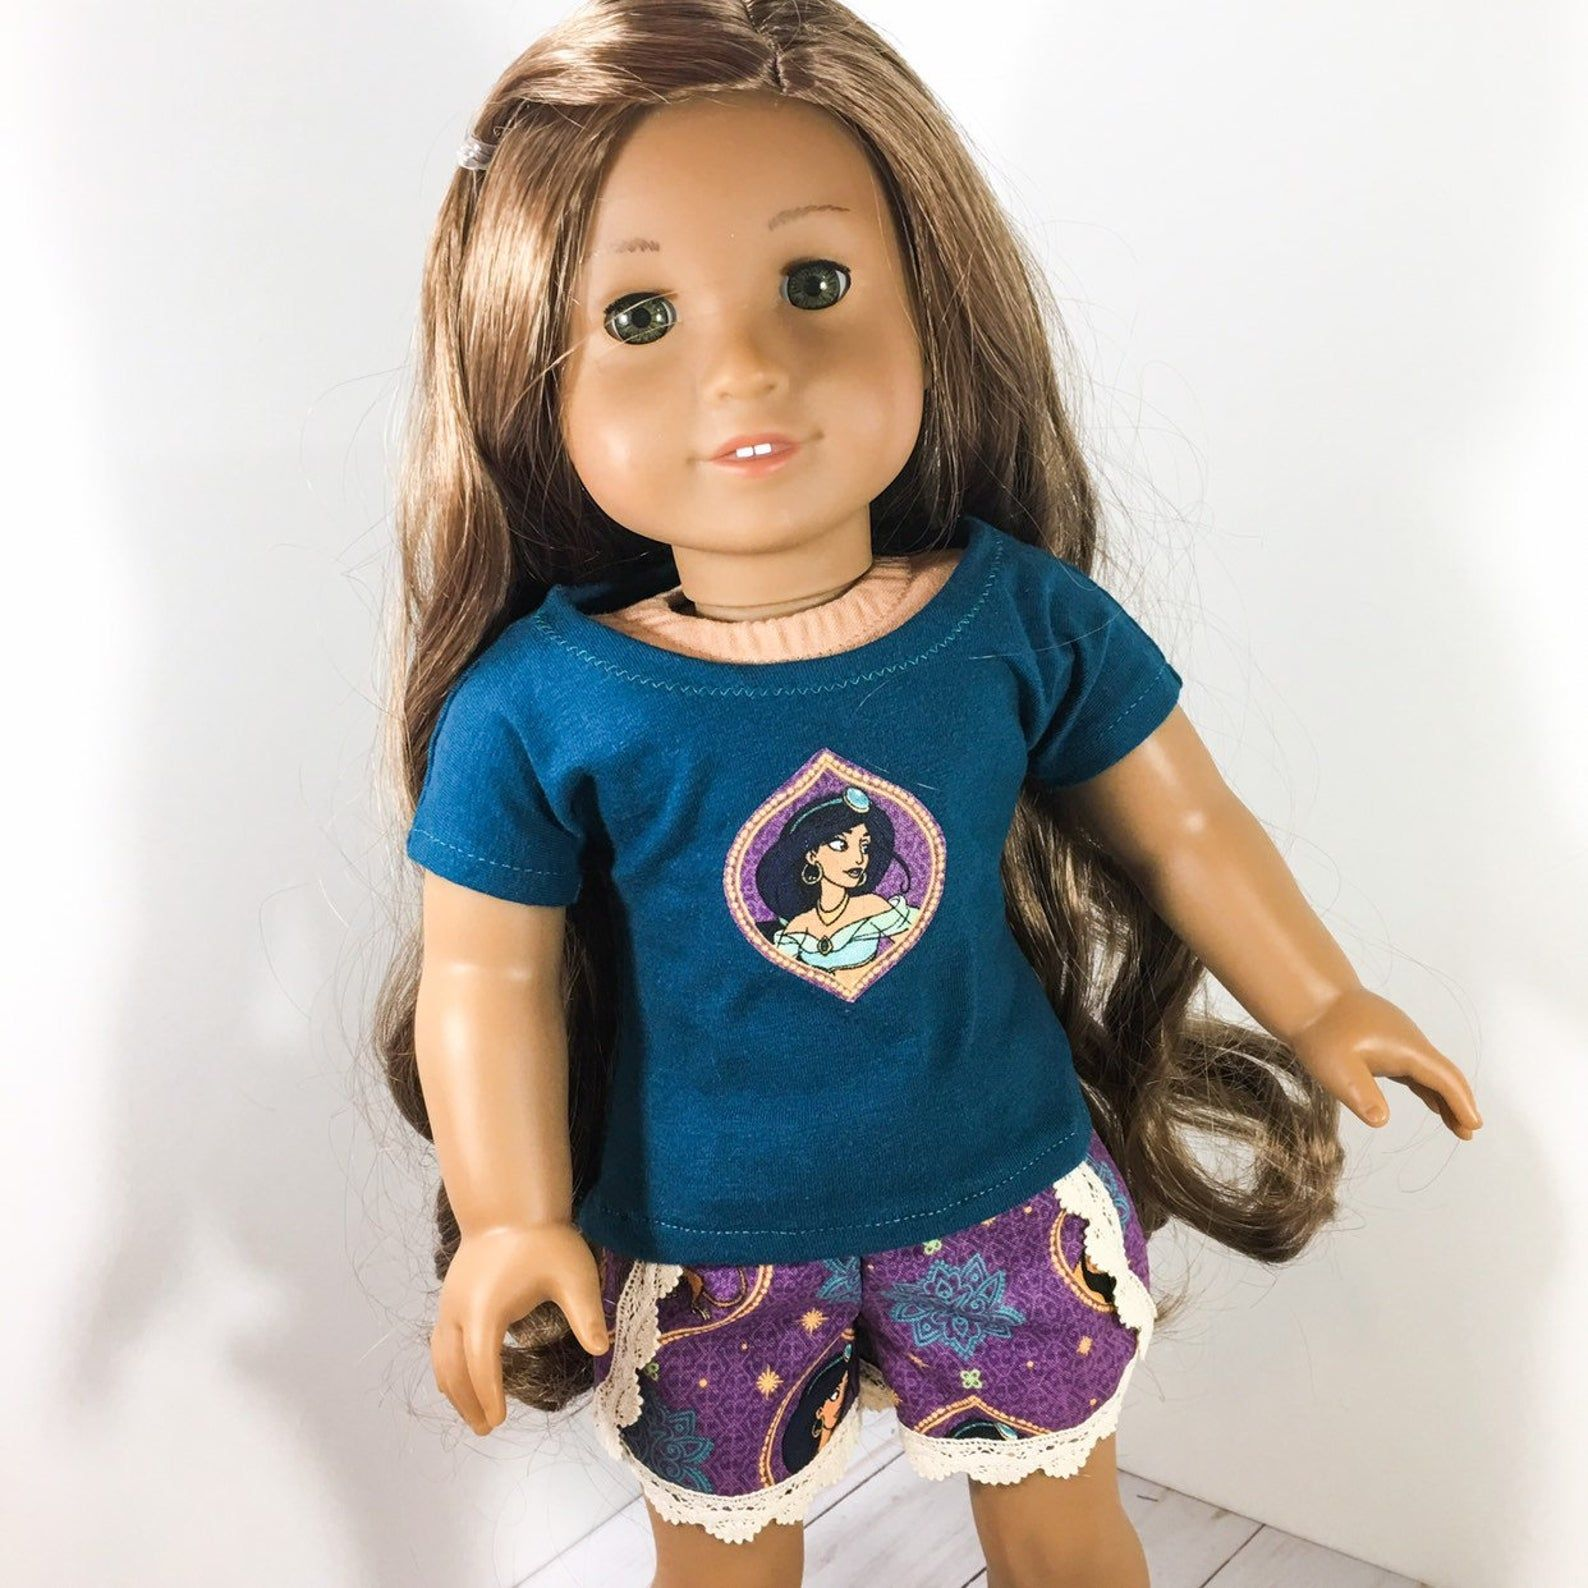 18 inch Doll Clothes - princess character print lace shorts